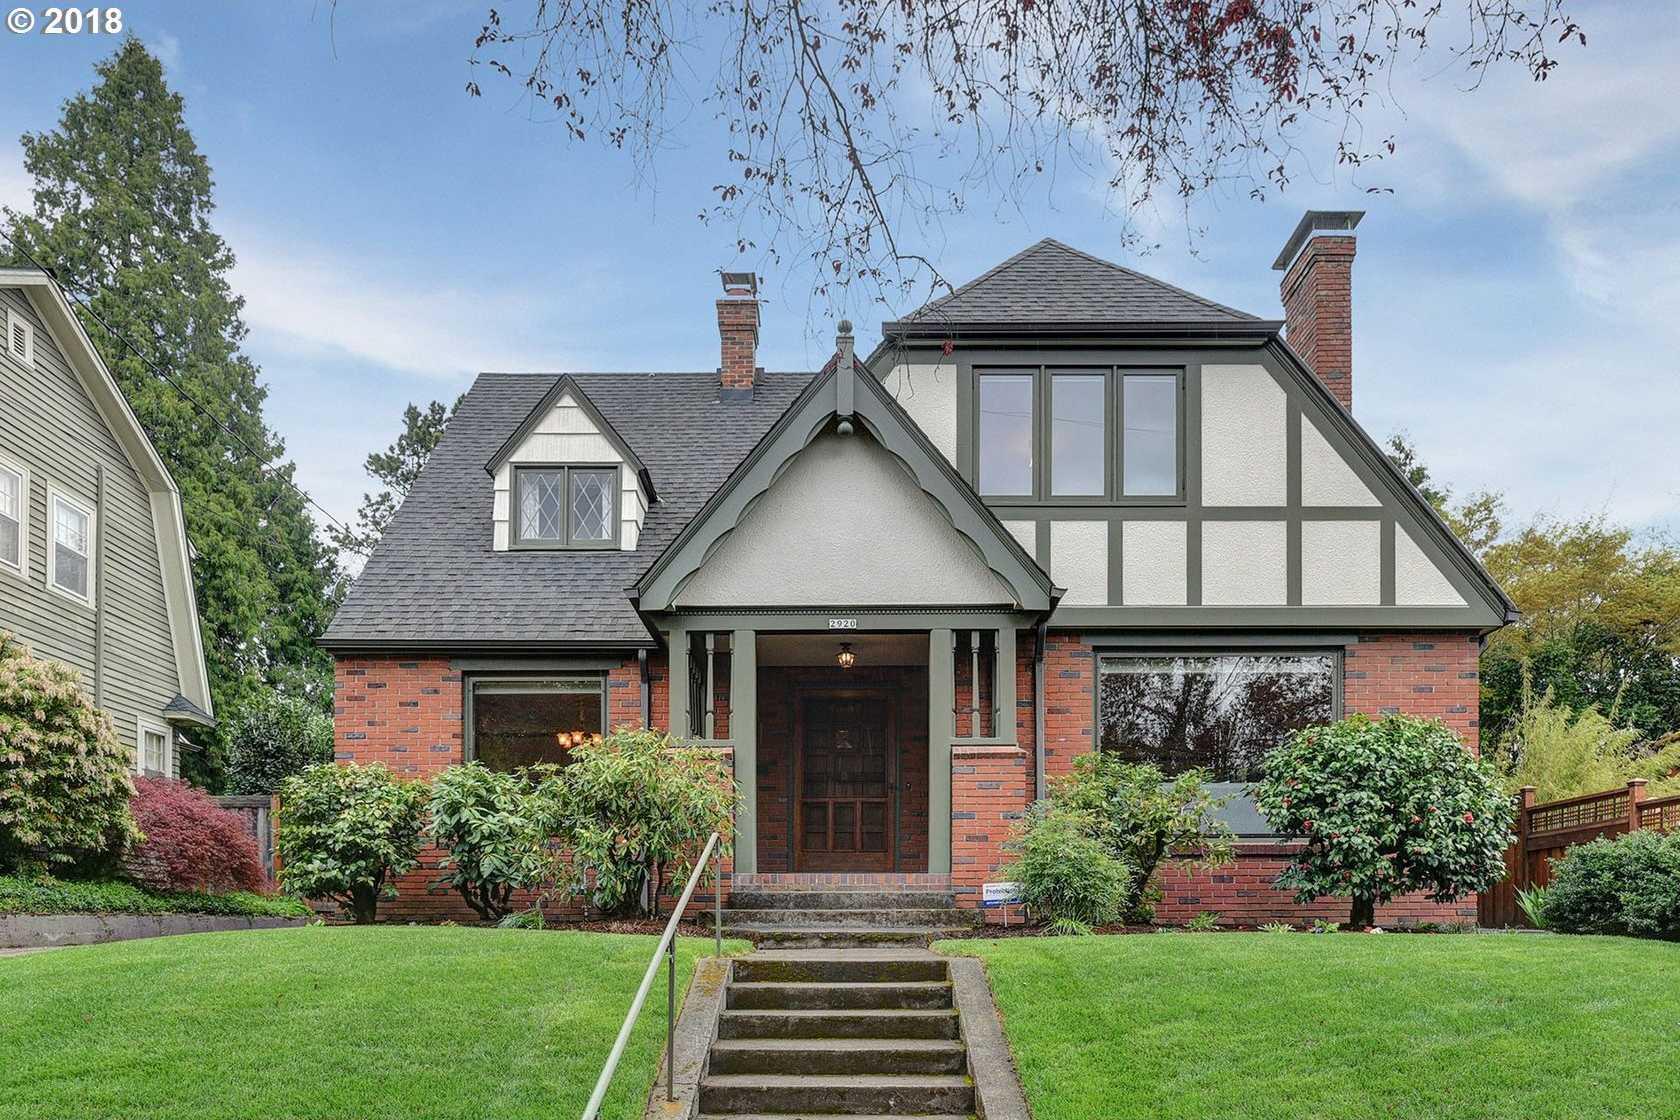 $859,900 - 4Br/2Ba -  for Sale in Alameda / Irvington, Portland